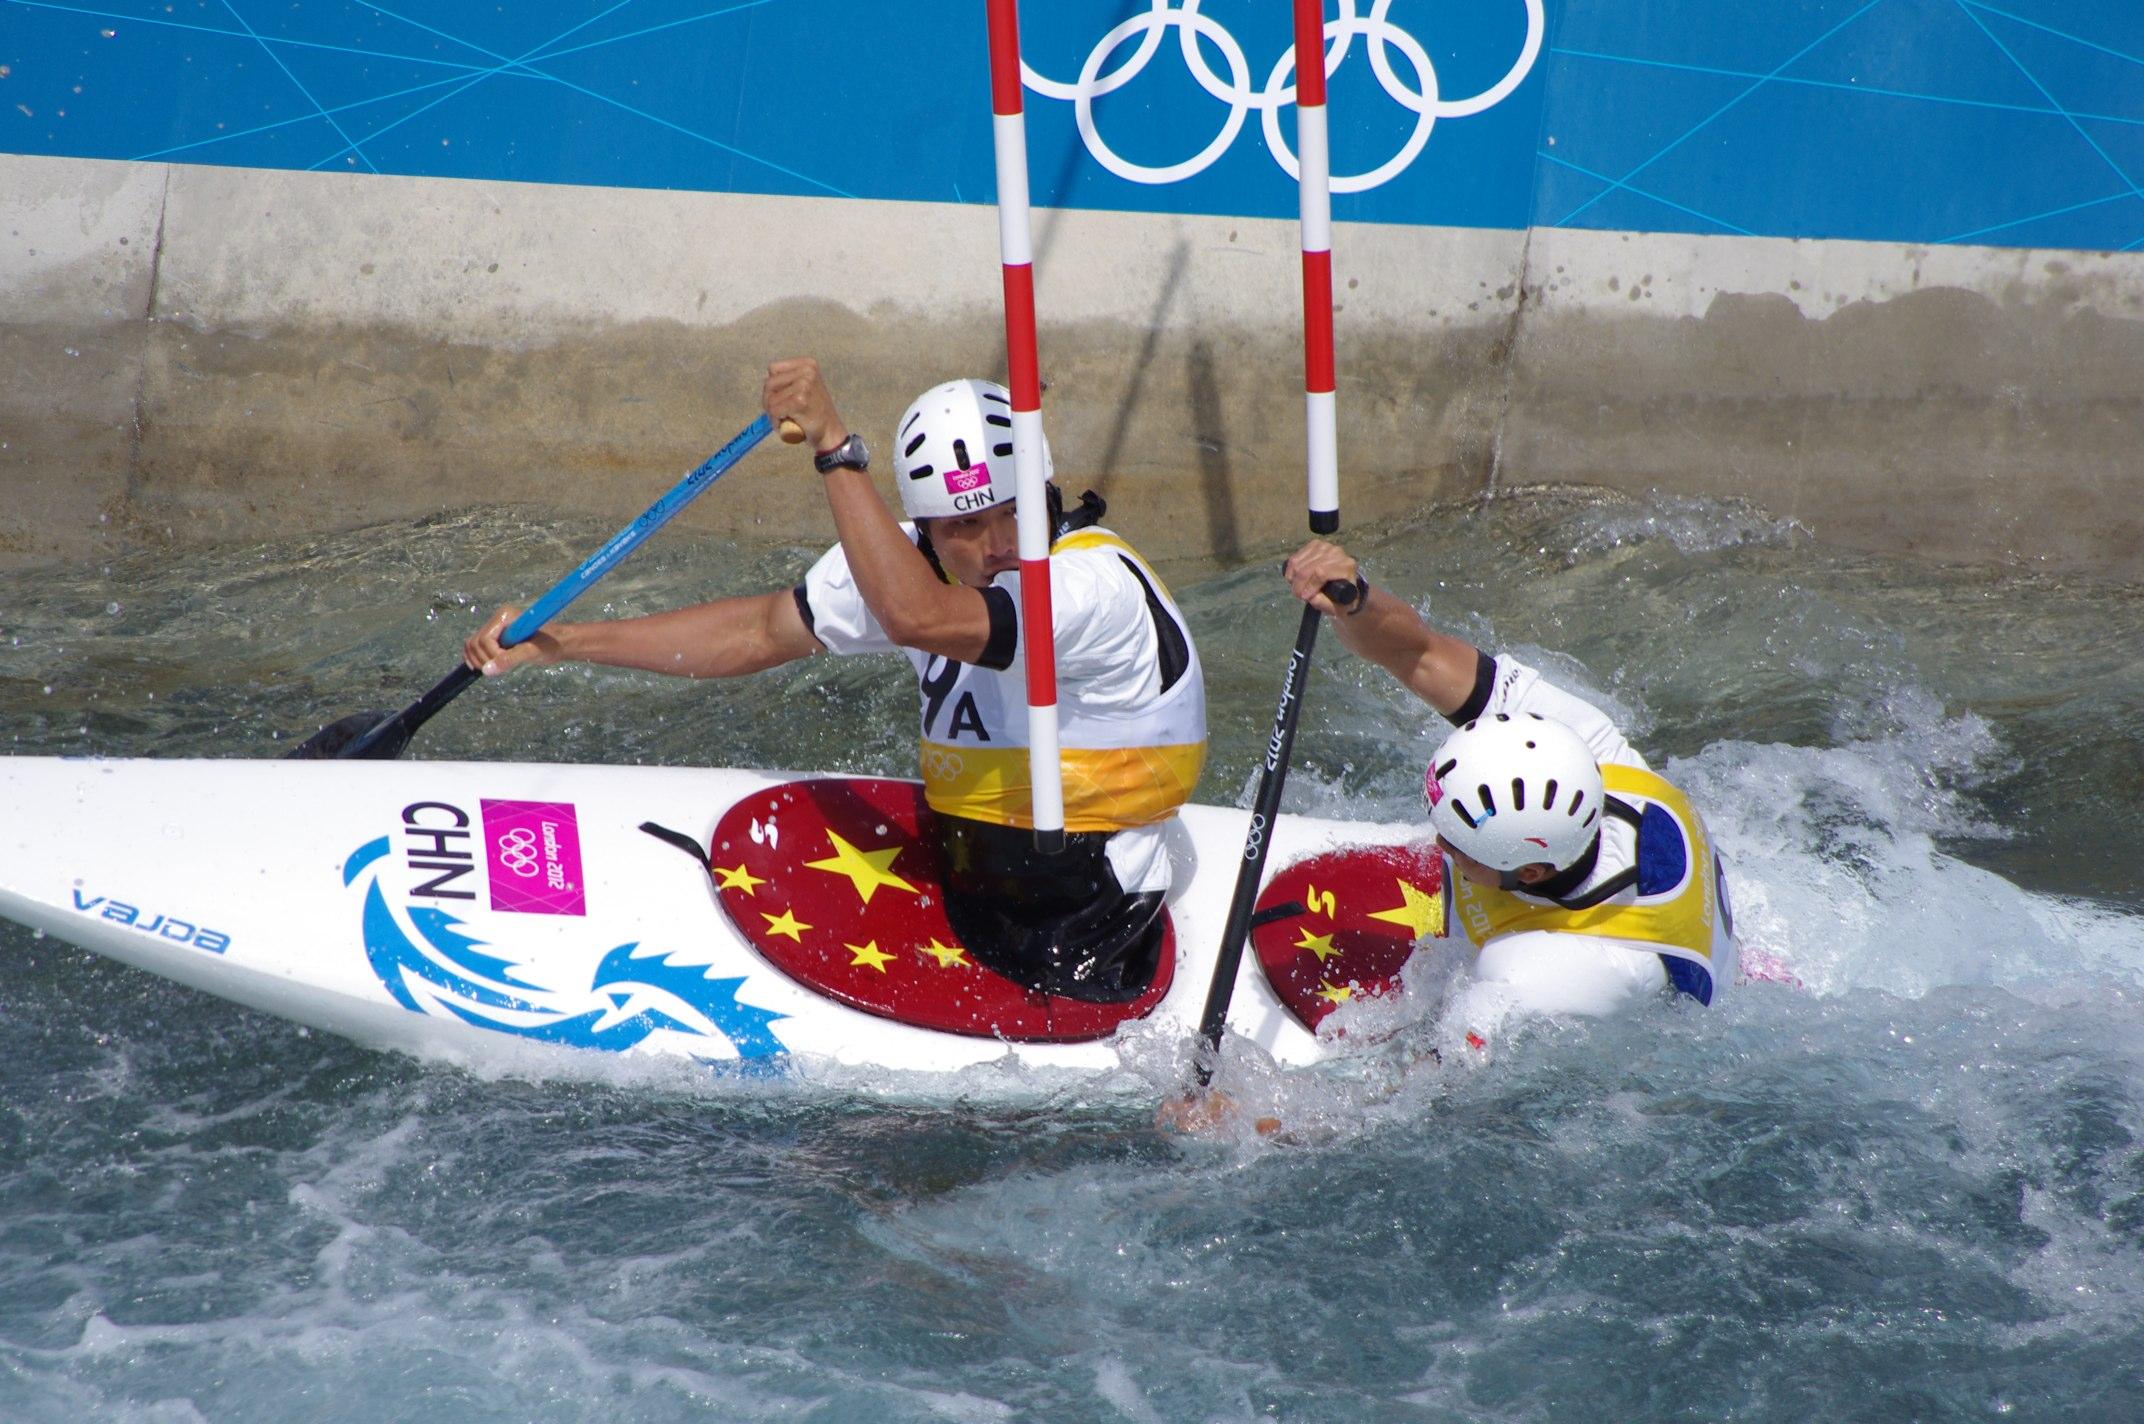 FileSlalom Canoeing 2012 Olympics C2 CHN Hu Minghai And Shu Junrong